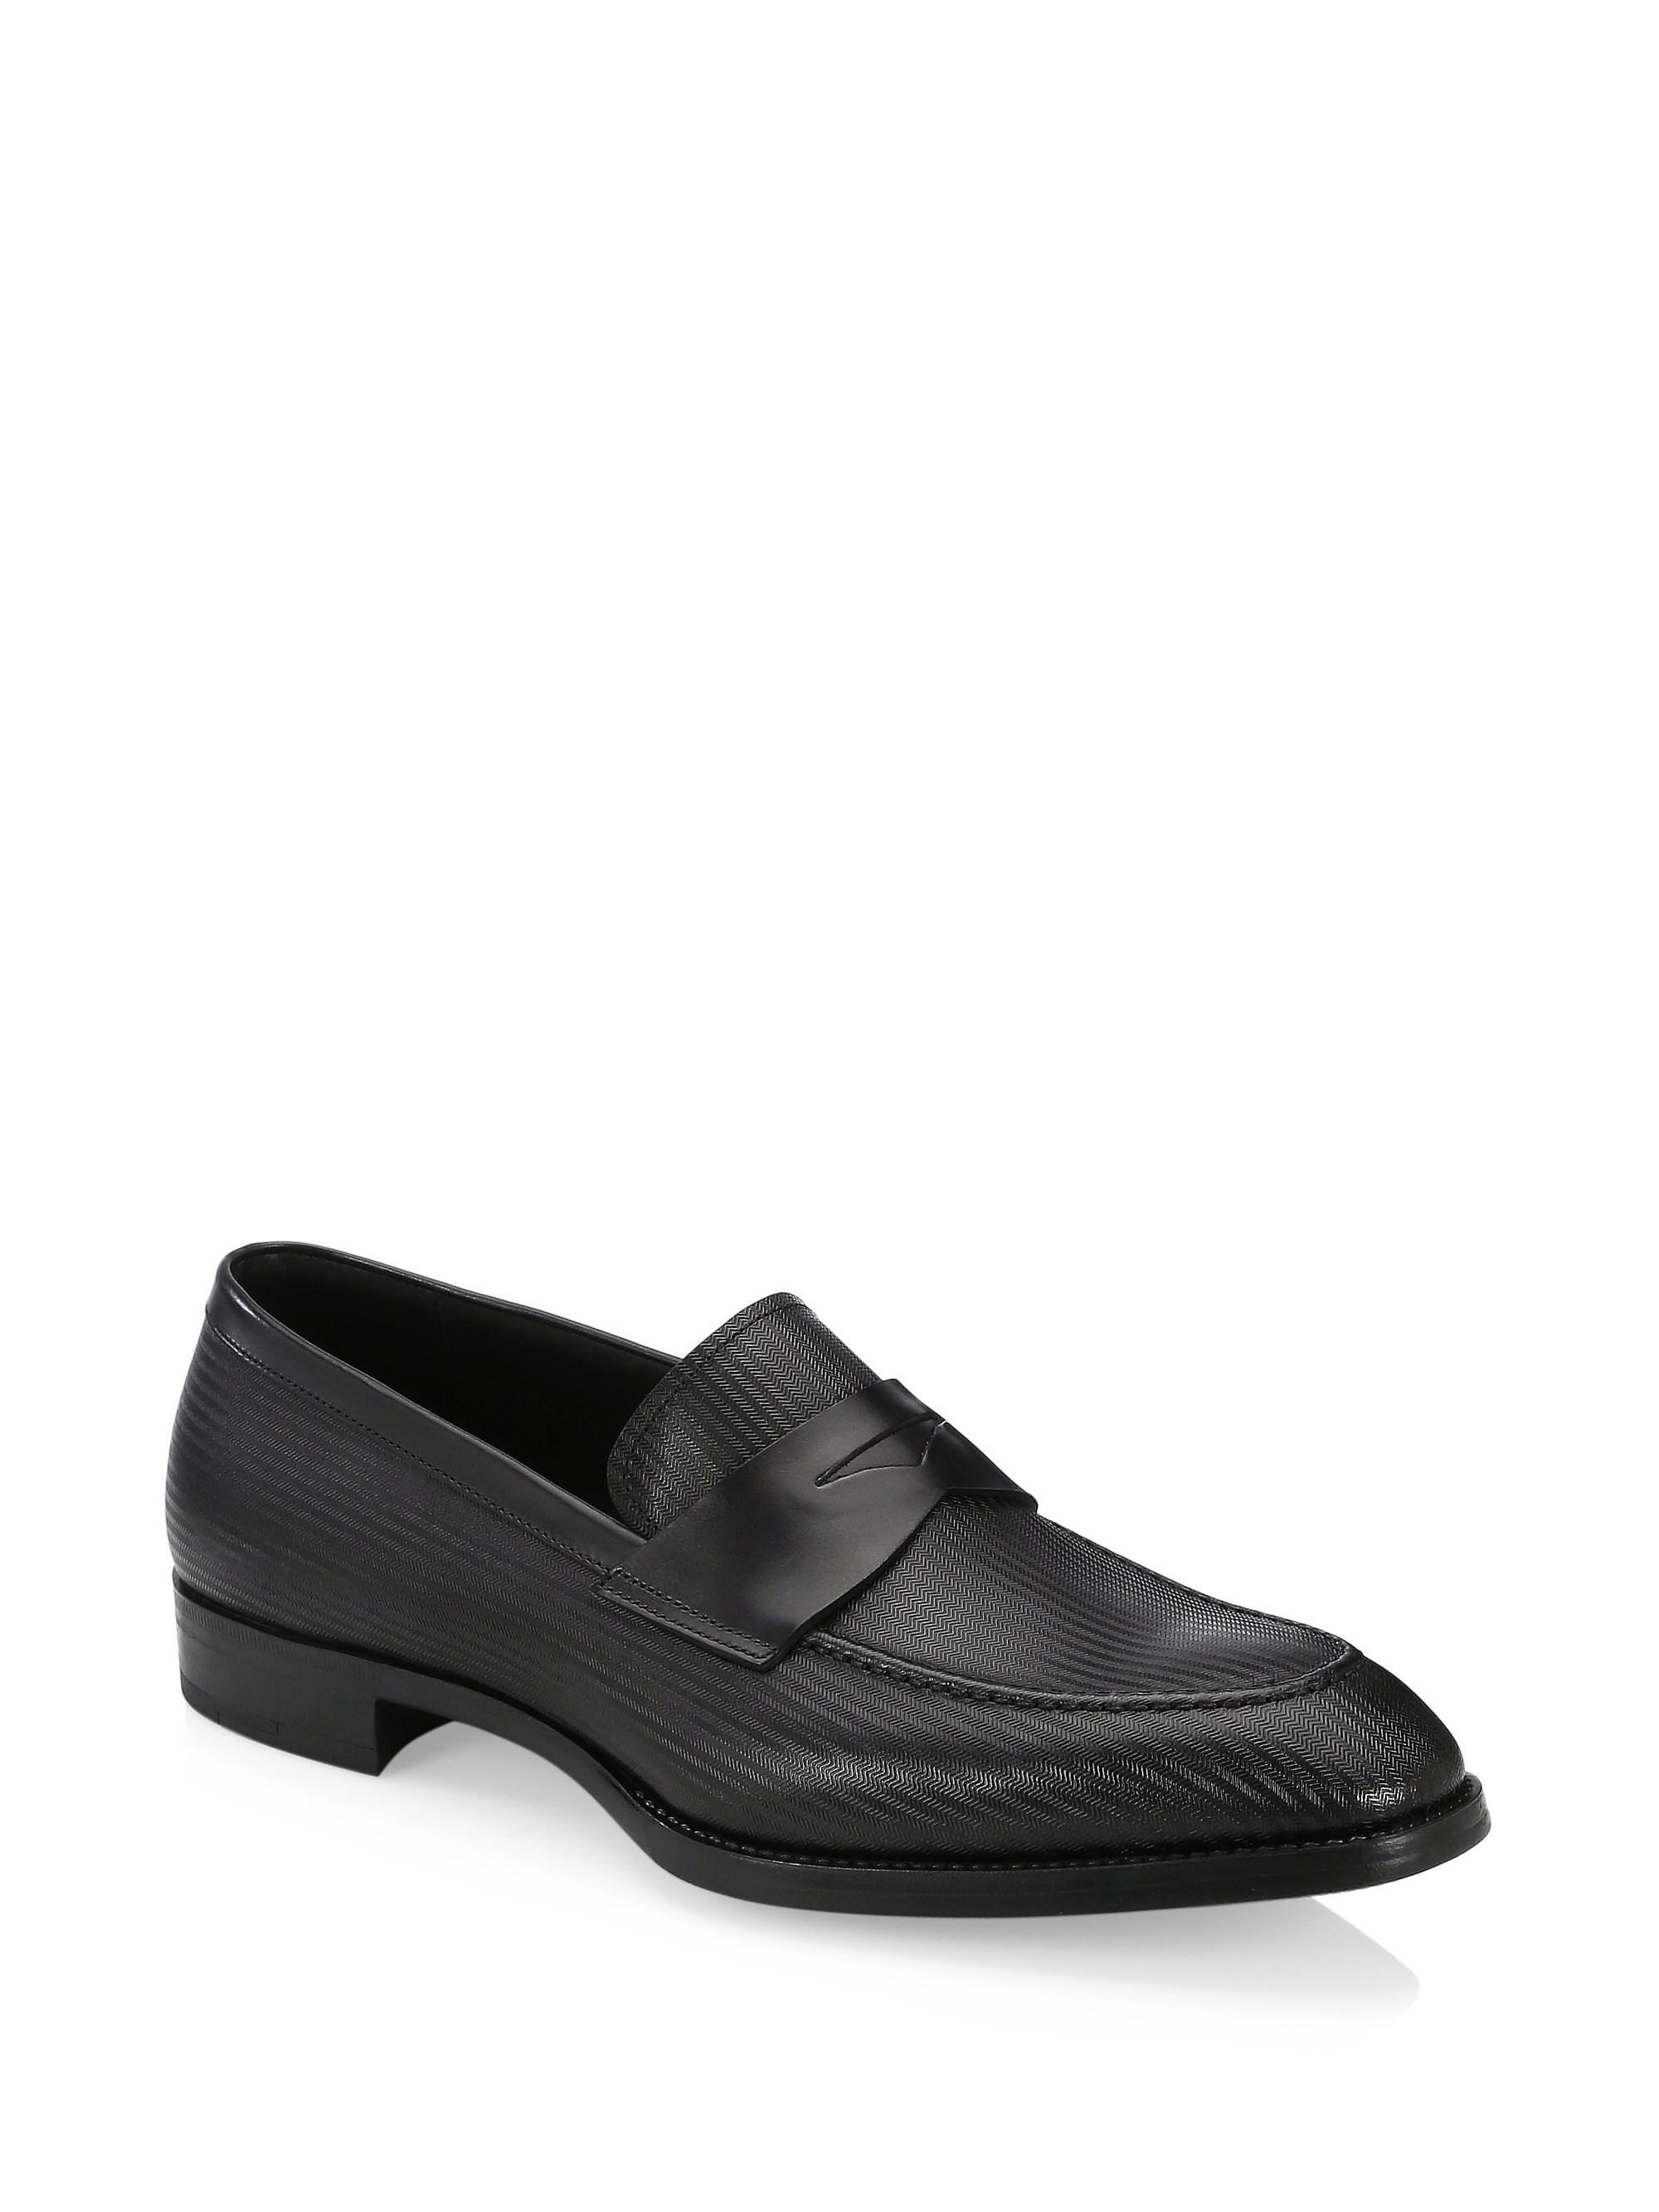 ArmaniIllusion Stripe Leather Loafers pydZW